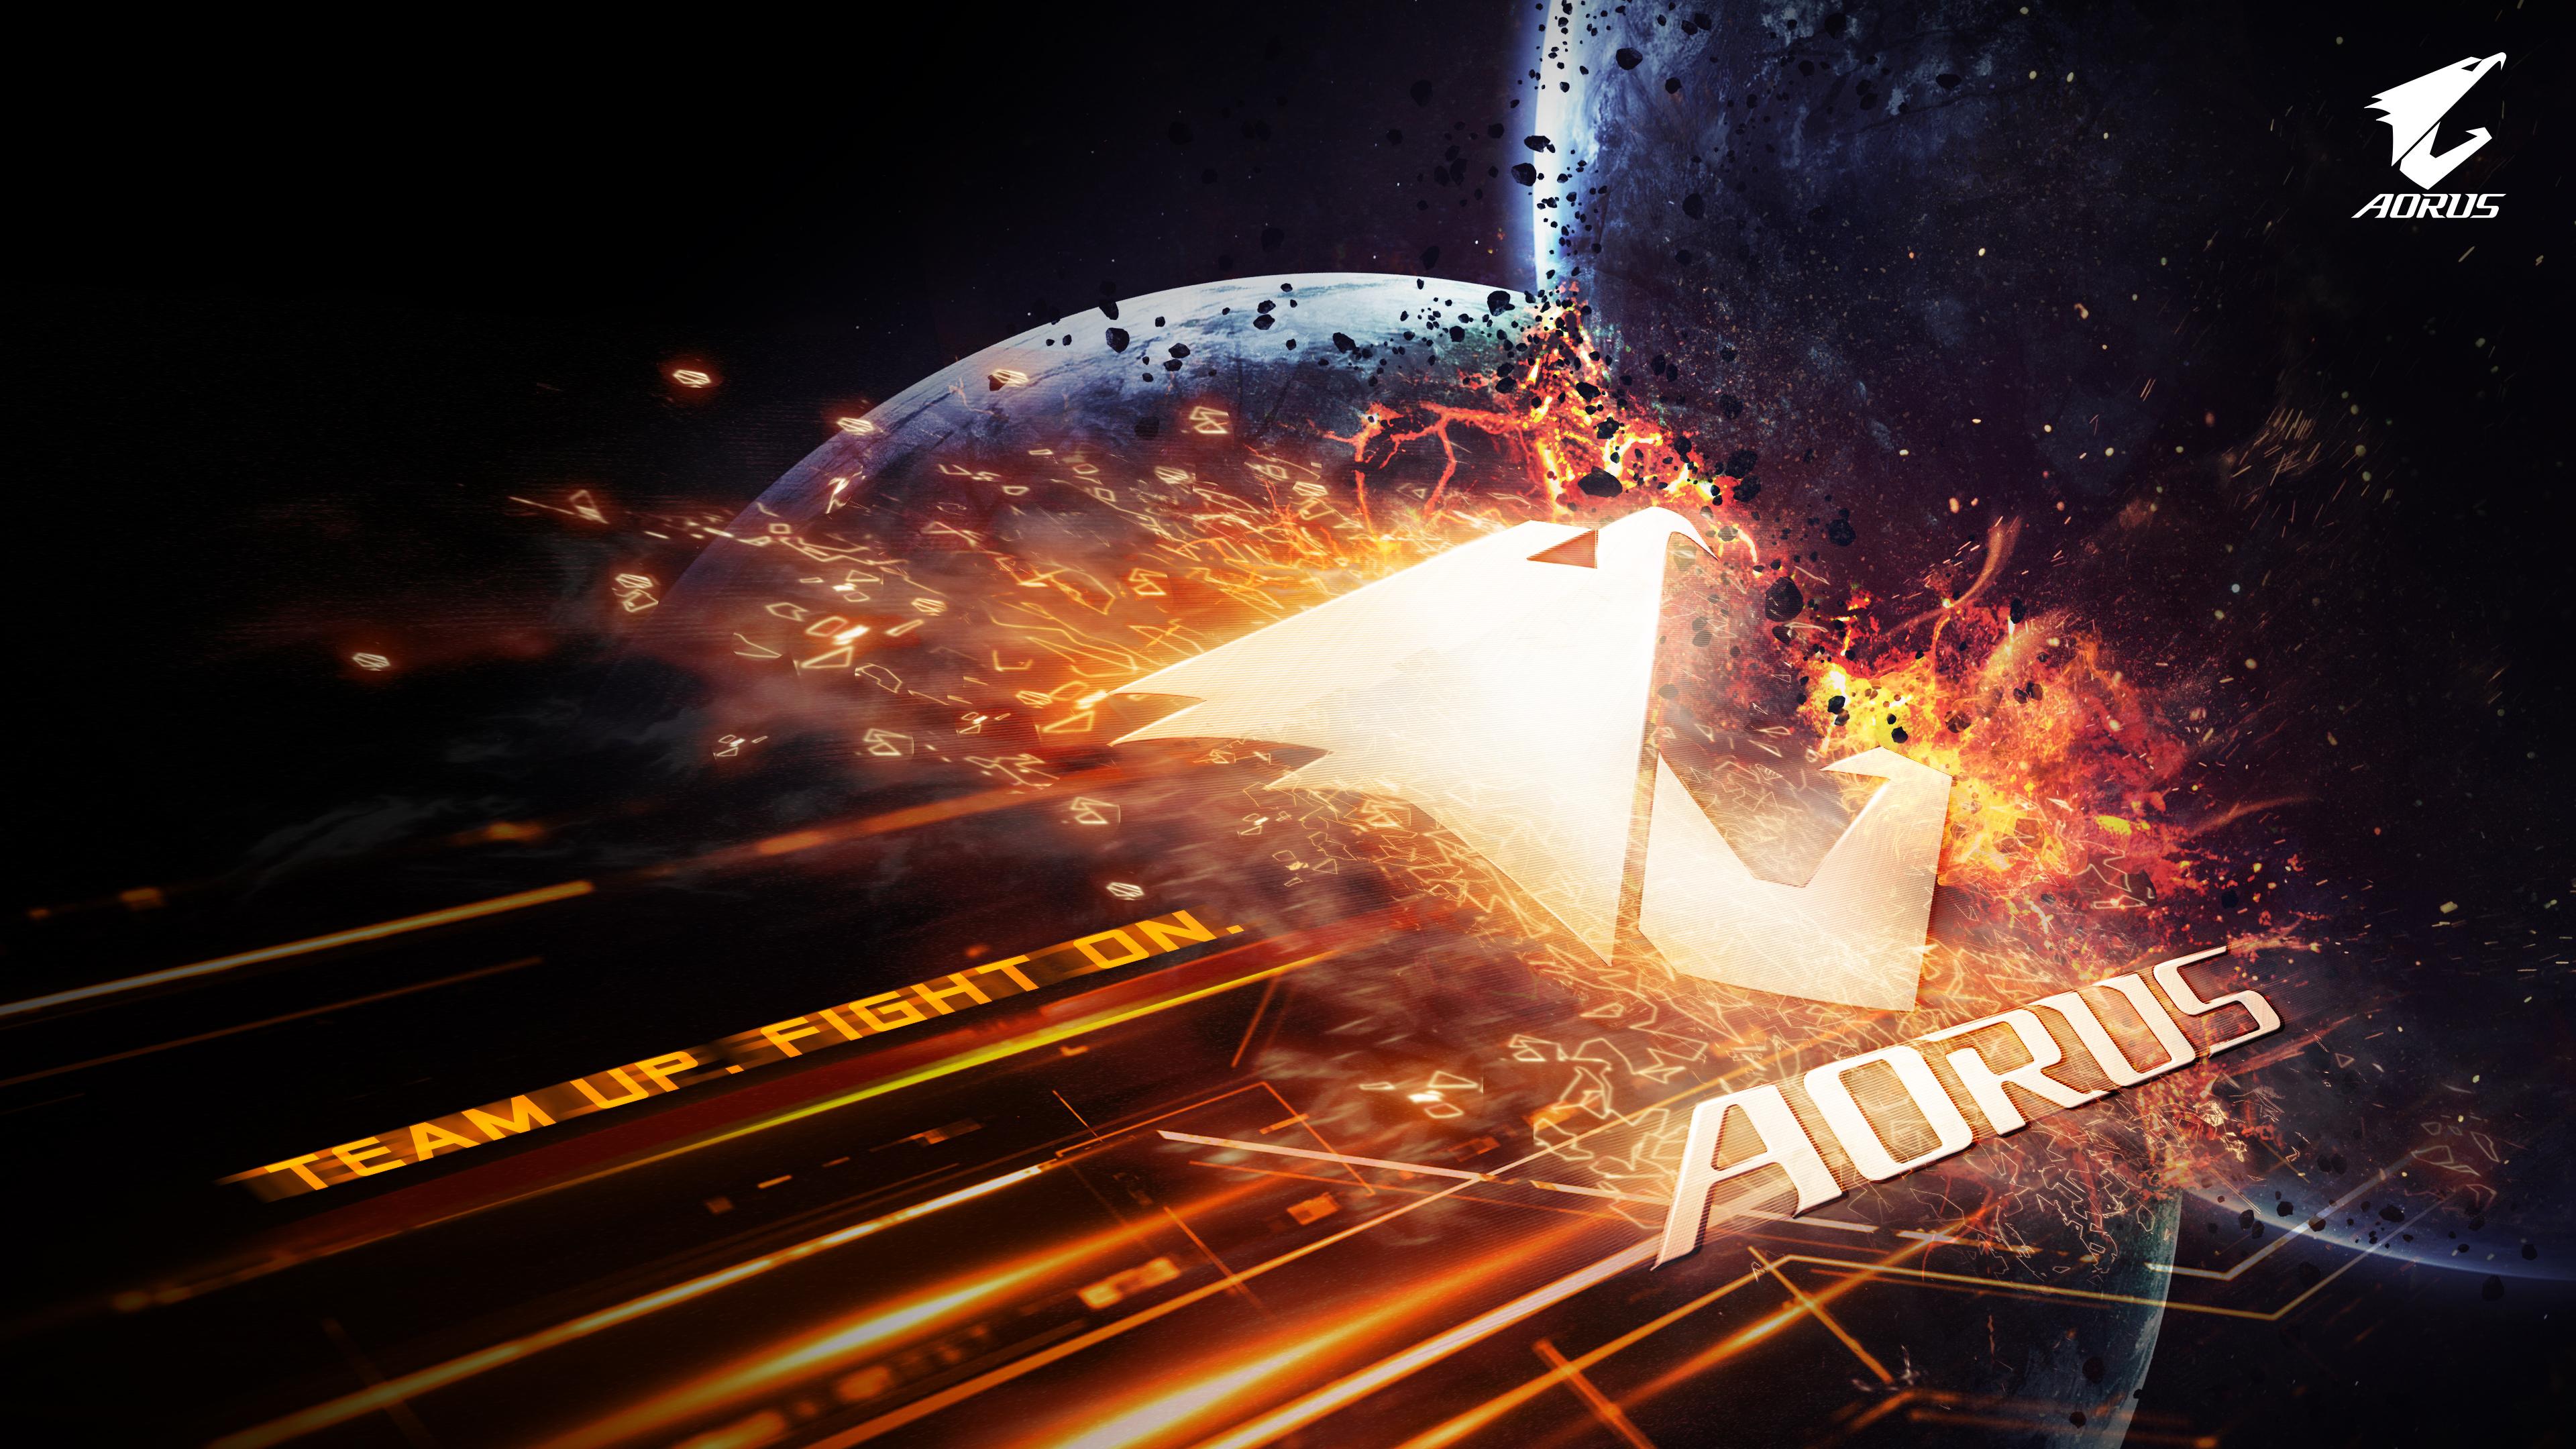 Gaming Unleashed Fond Ecran Aorus 1064590 Hd Wallpaper Backgrounds Download